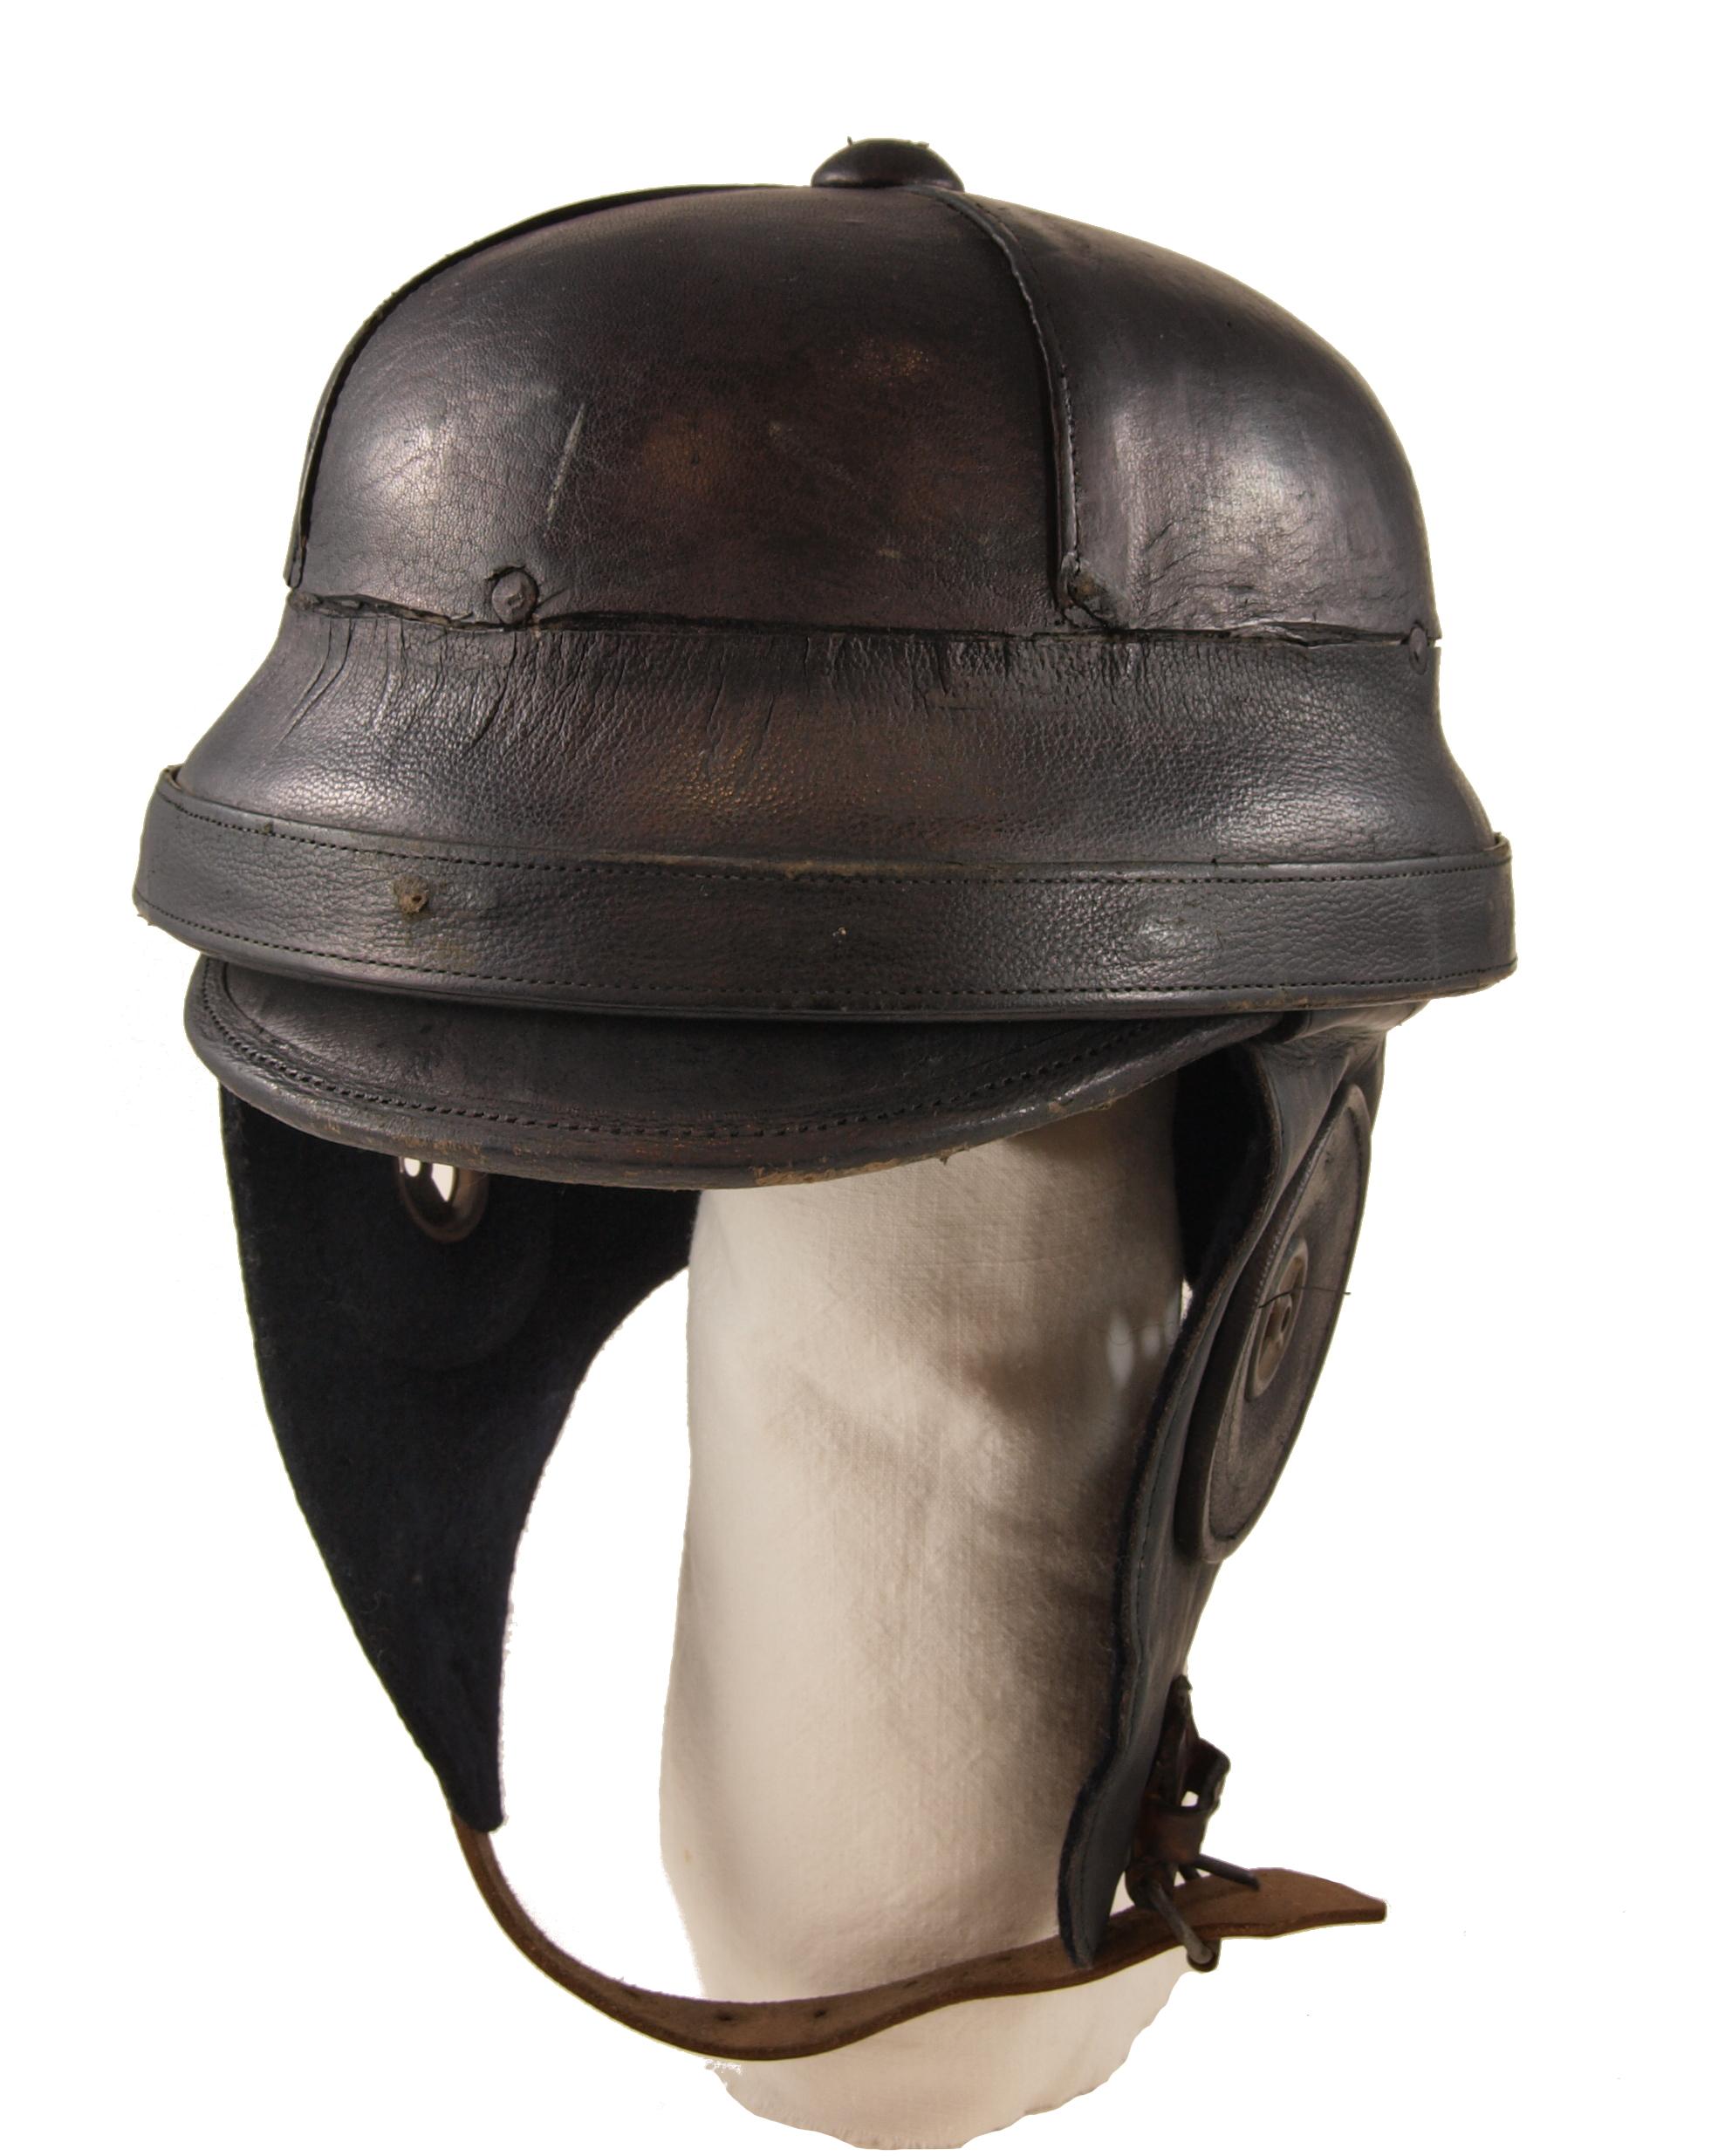 File:German WW1 Pilots Helmet 1 jpg - Wikimedia Commons